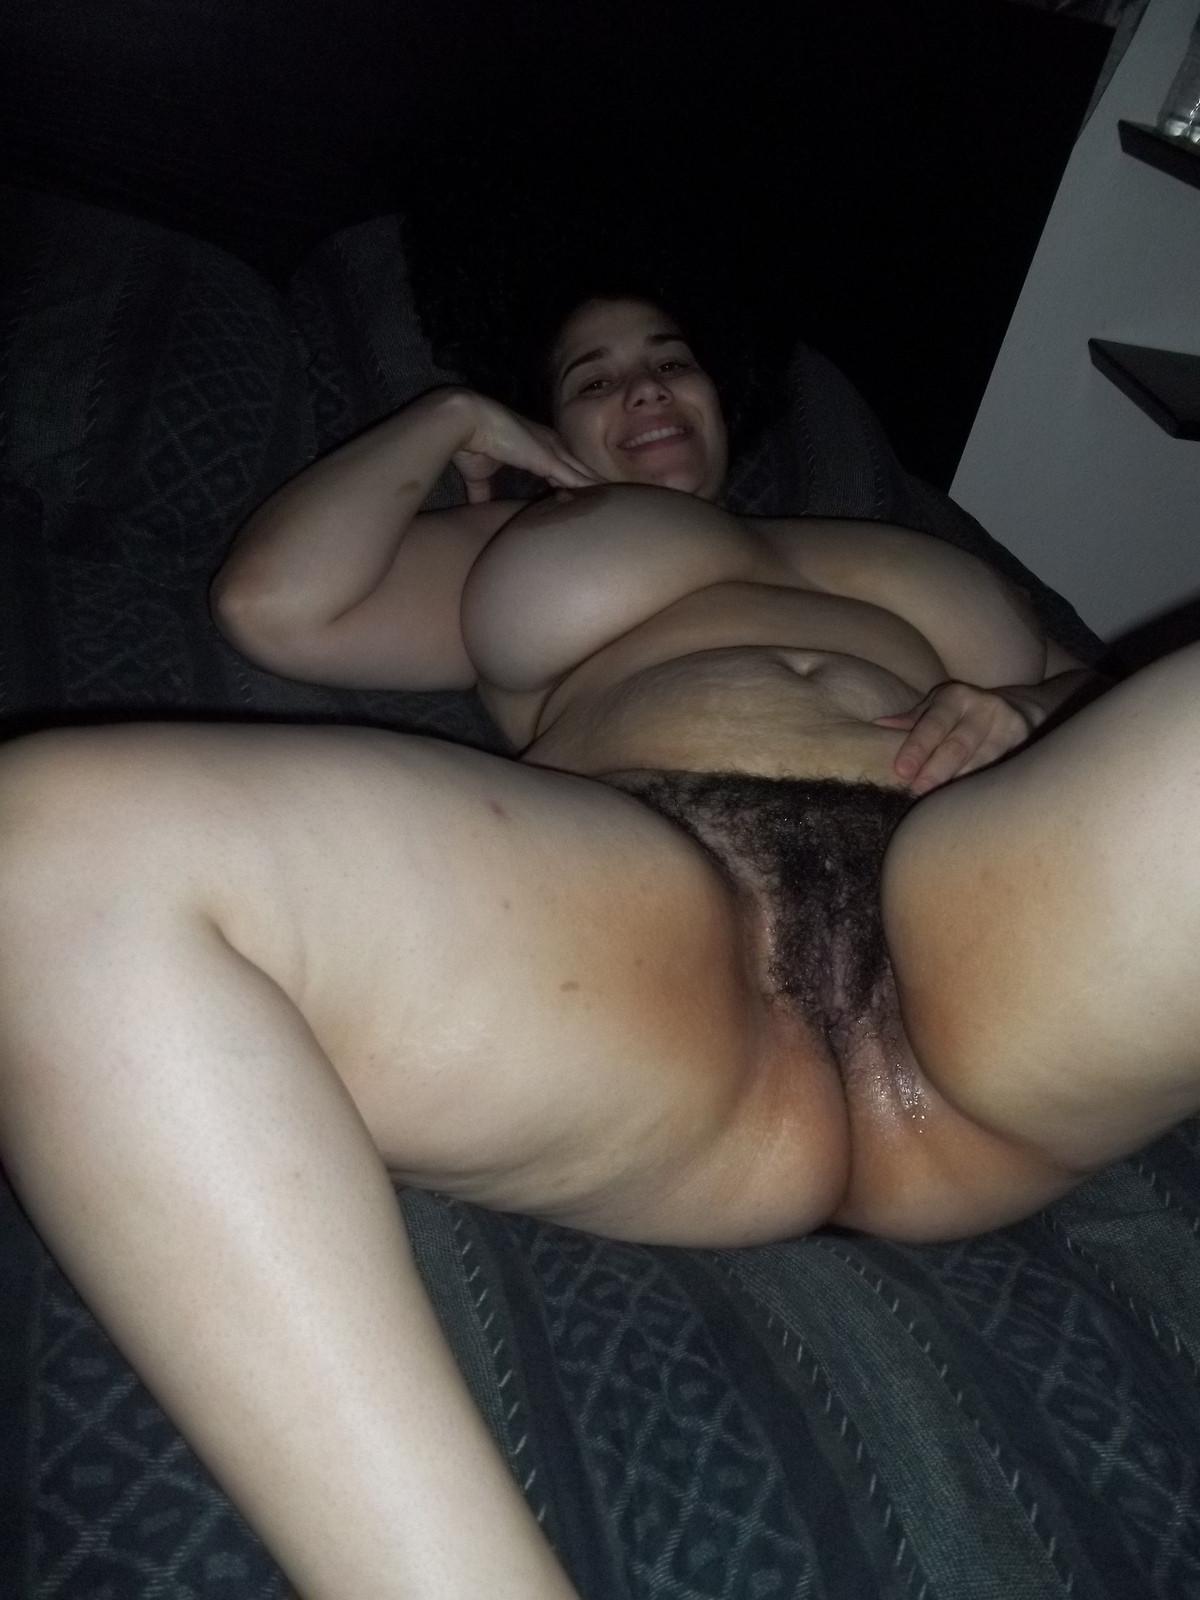 Турчанки пухляшки порно, девчонки на кухне эротика